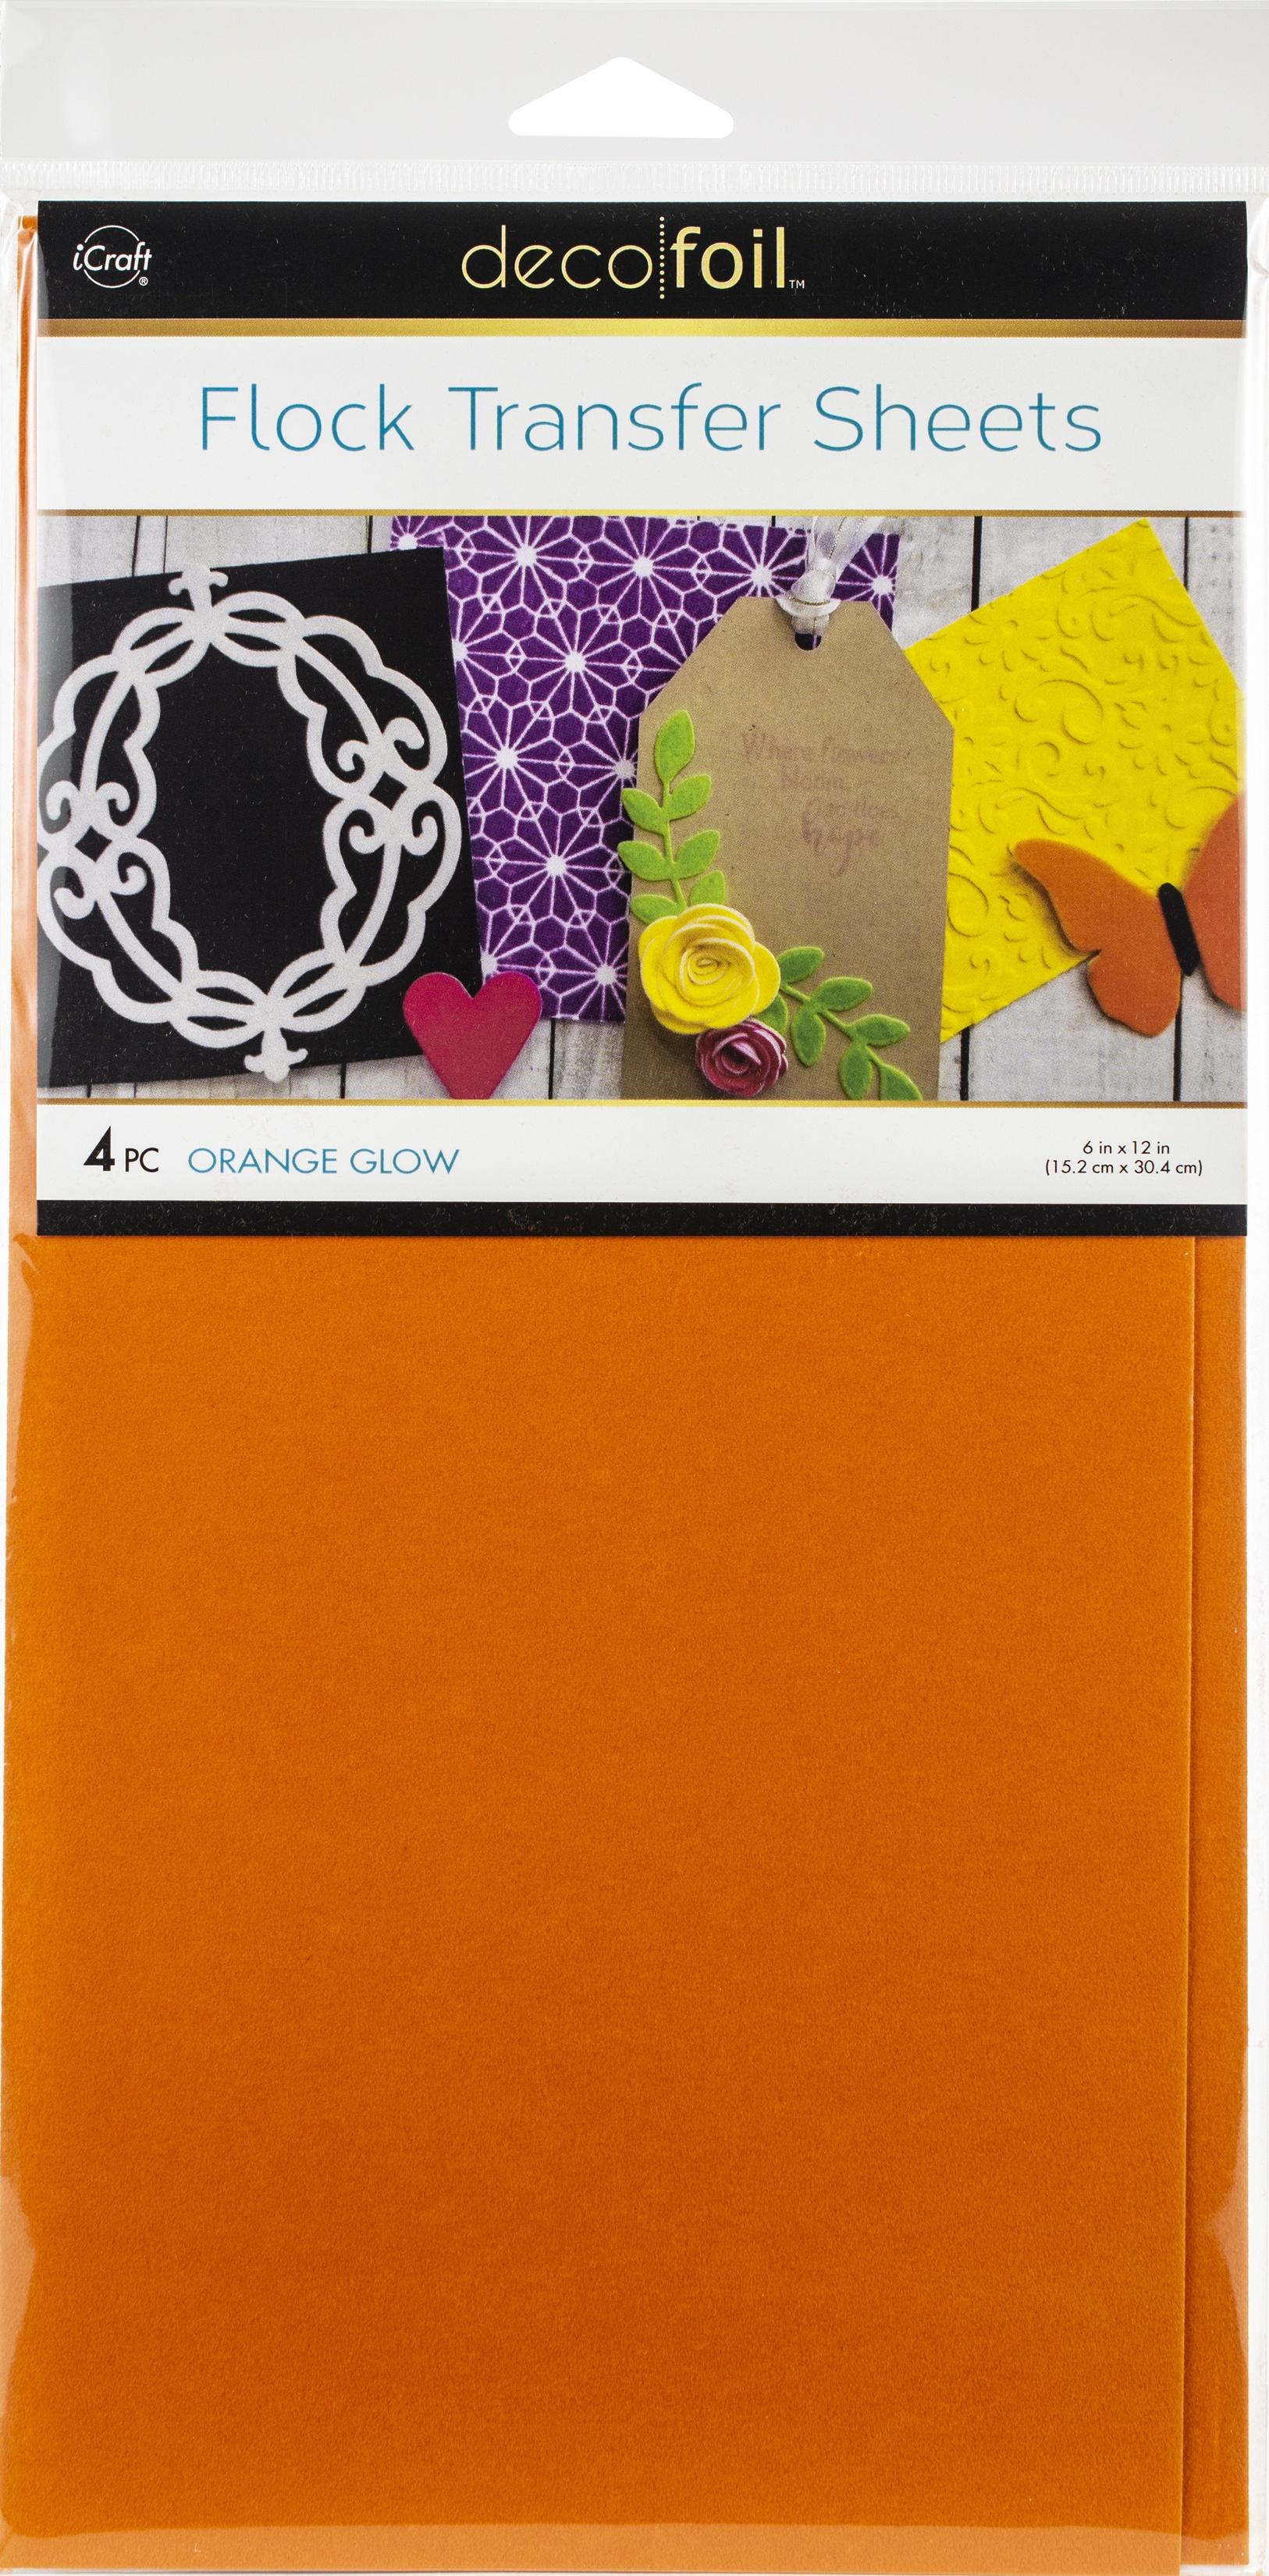 Deco Foil Flock Transfer Sheets 6X12 4/Pkg-Orange Glow